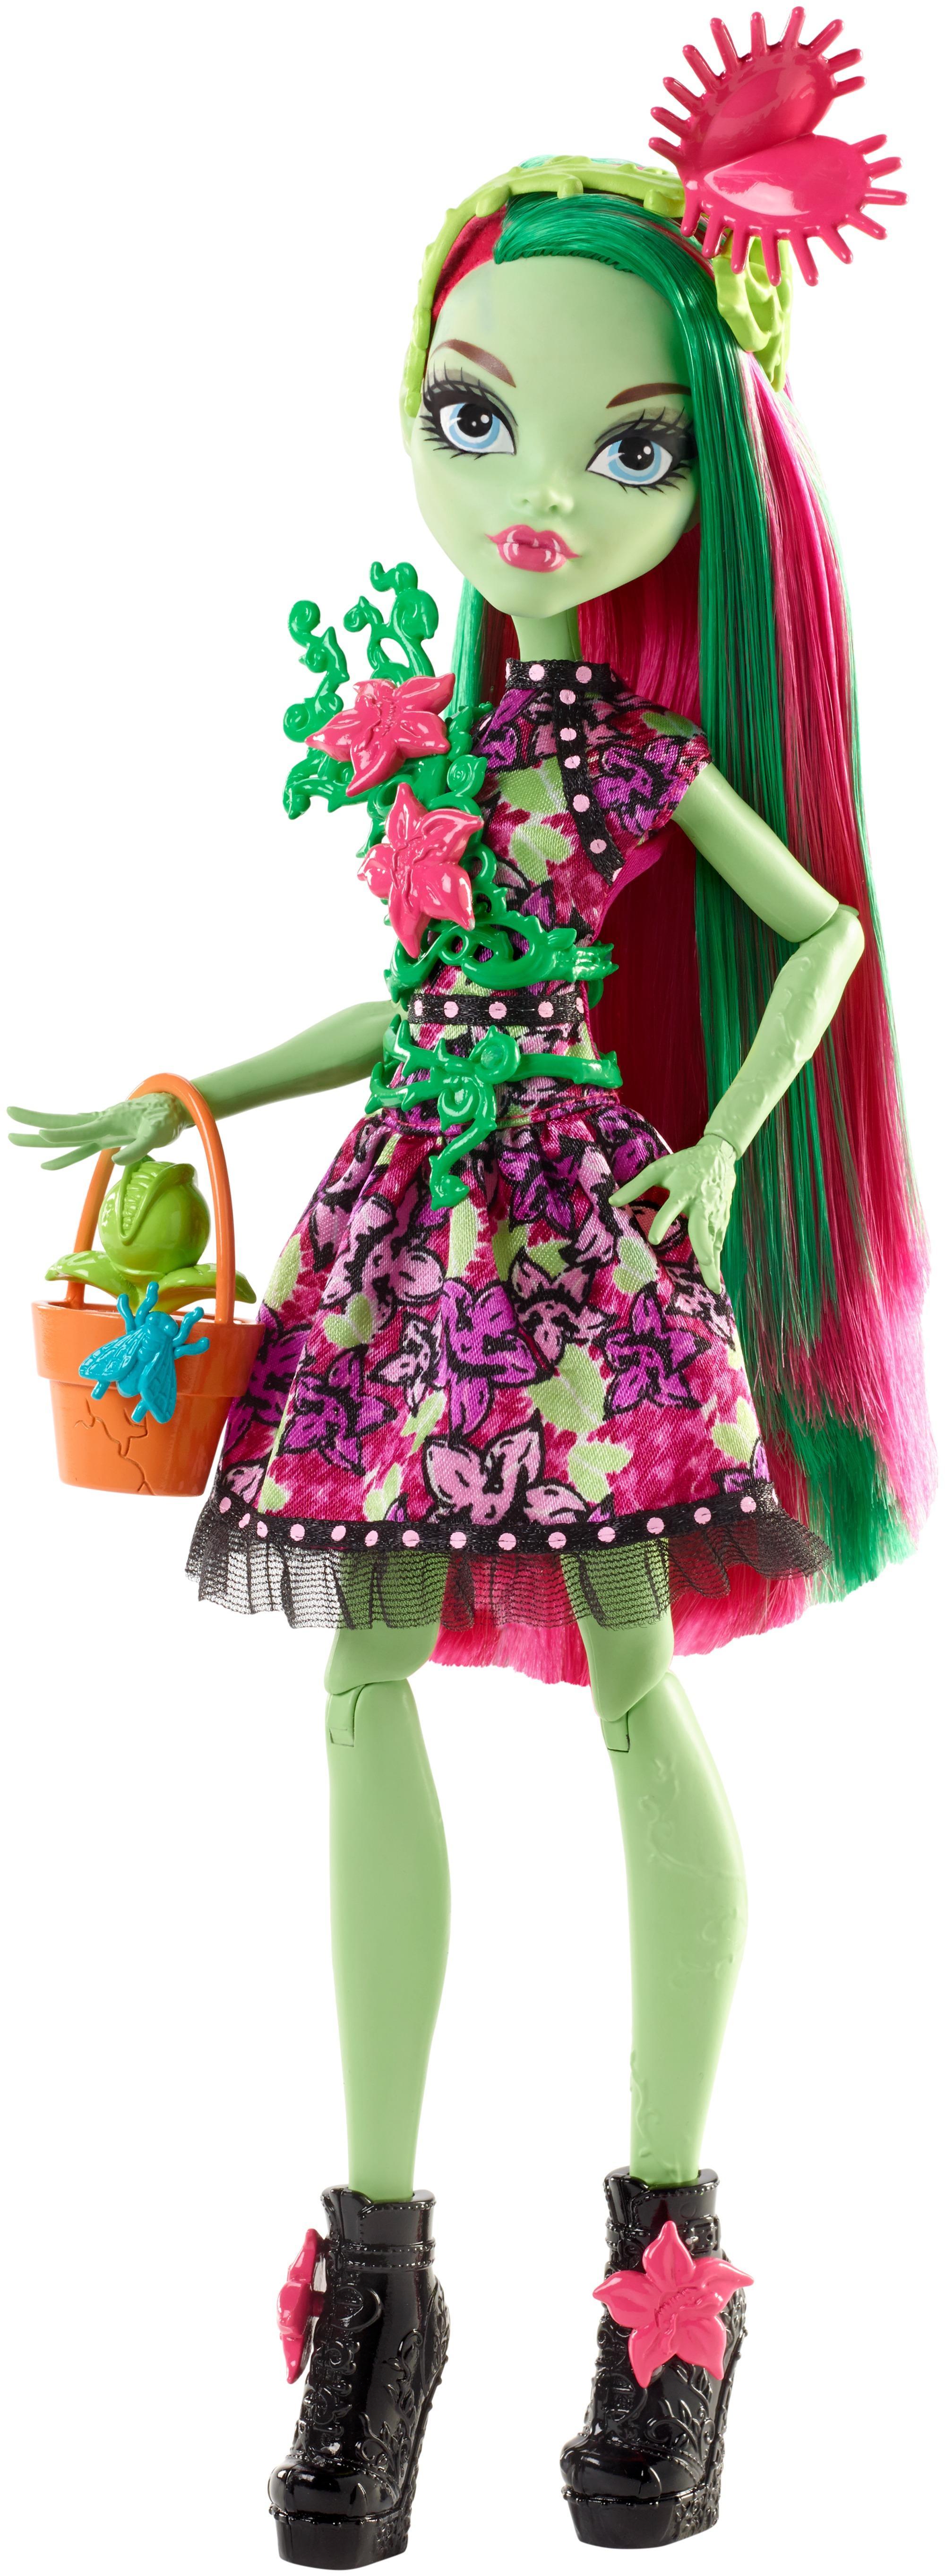 Venus Mcflytrap Doll Amazon.com: Mon...